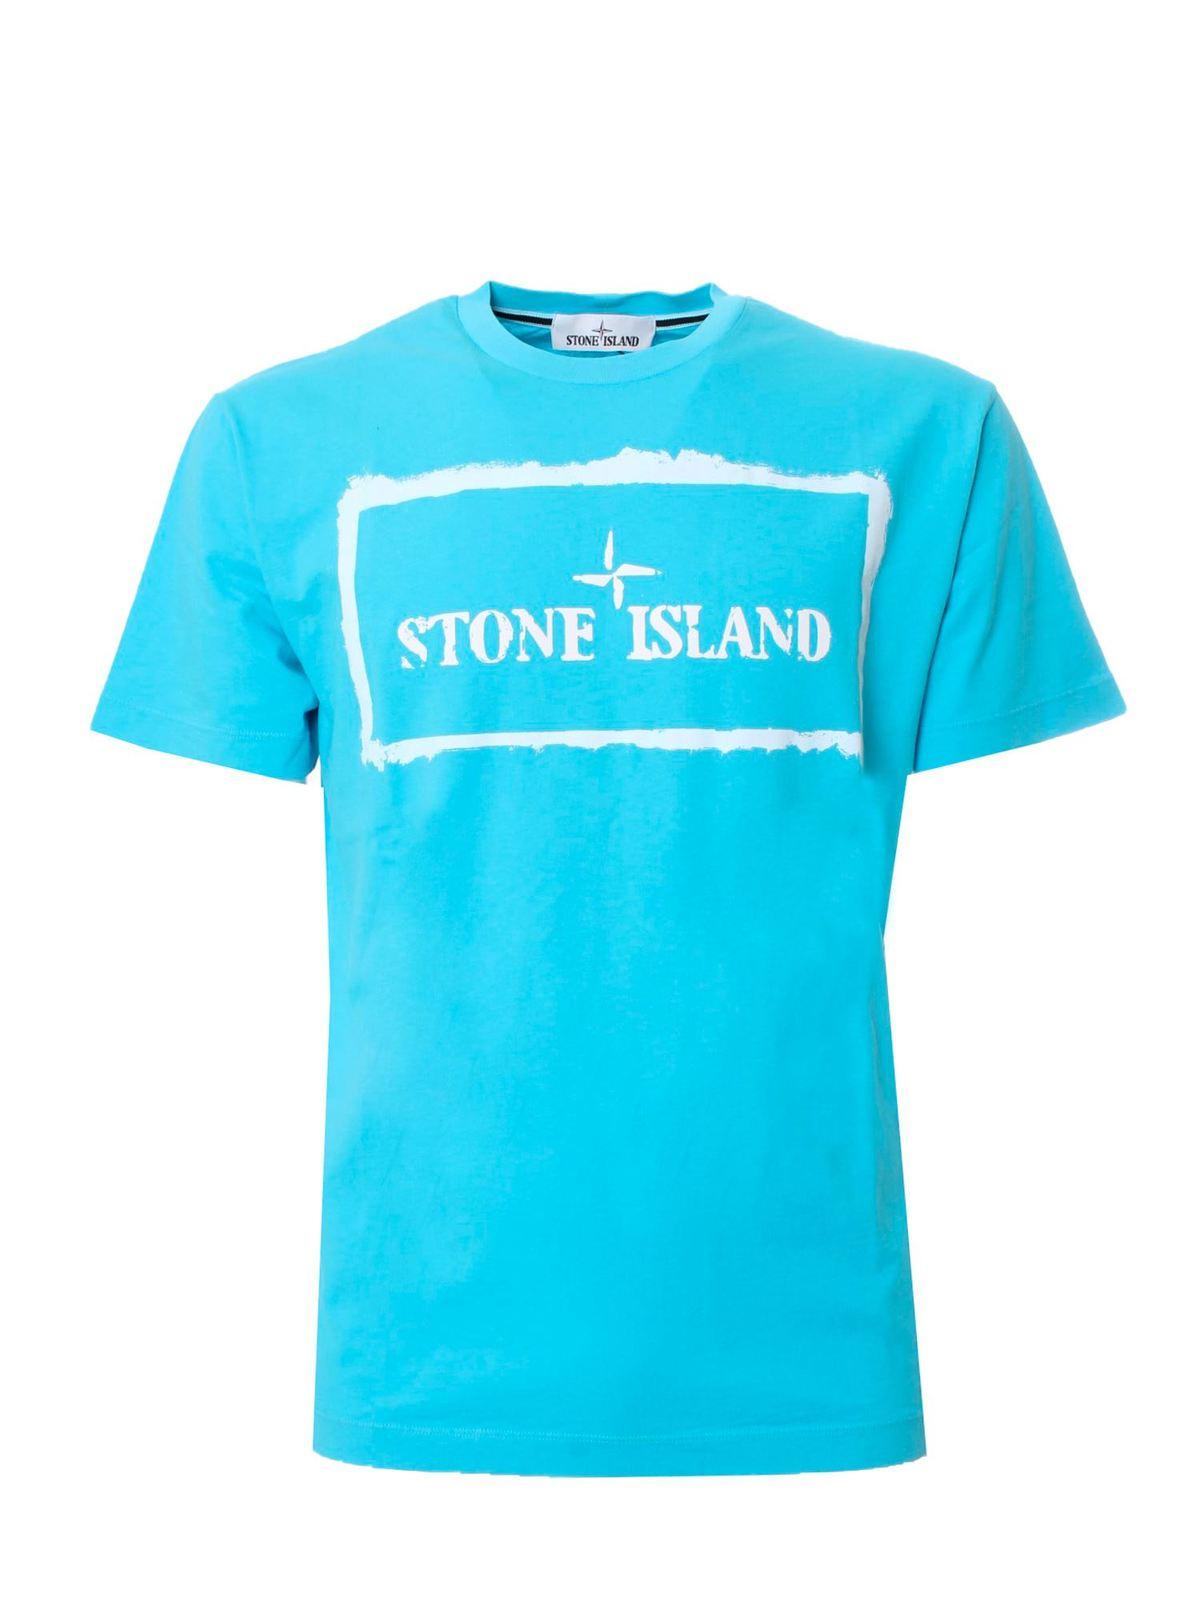 Stone Island LOGO T-SHIRT IN LIGHT BLUE